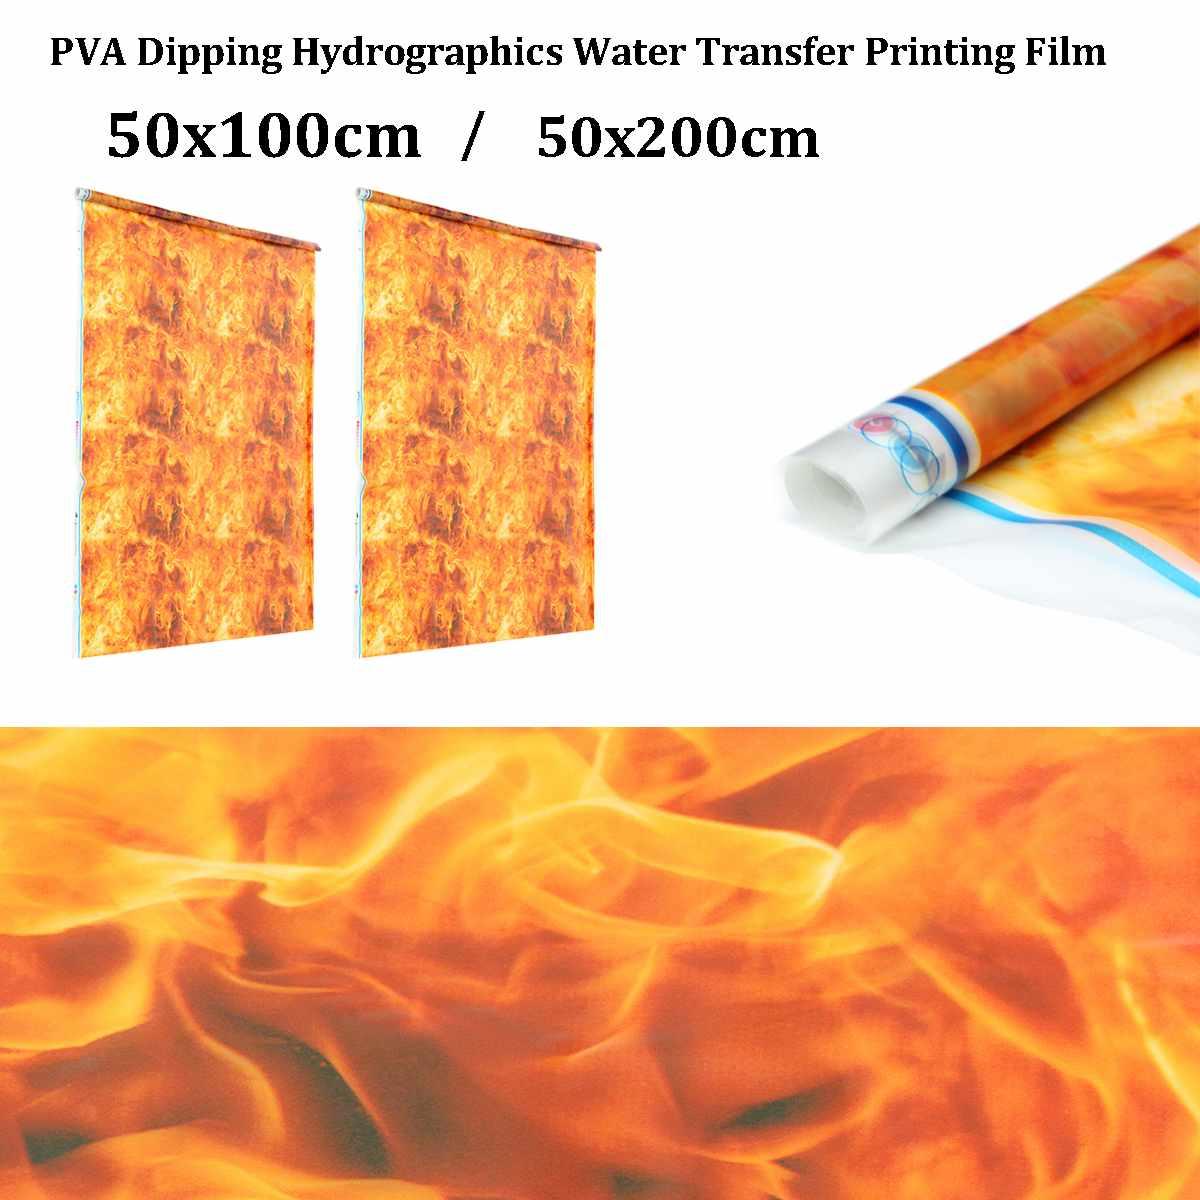 50x100cm/50x200cm Orange PVA Hydrographic Film Water Transfer Printing Film Hydro Dip Style  Decals Stickers